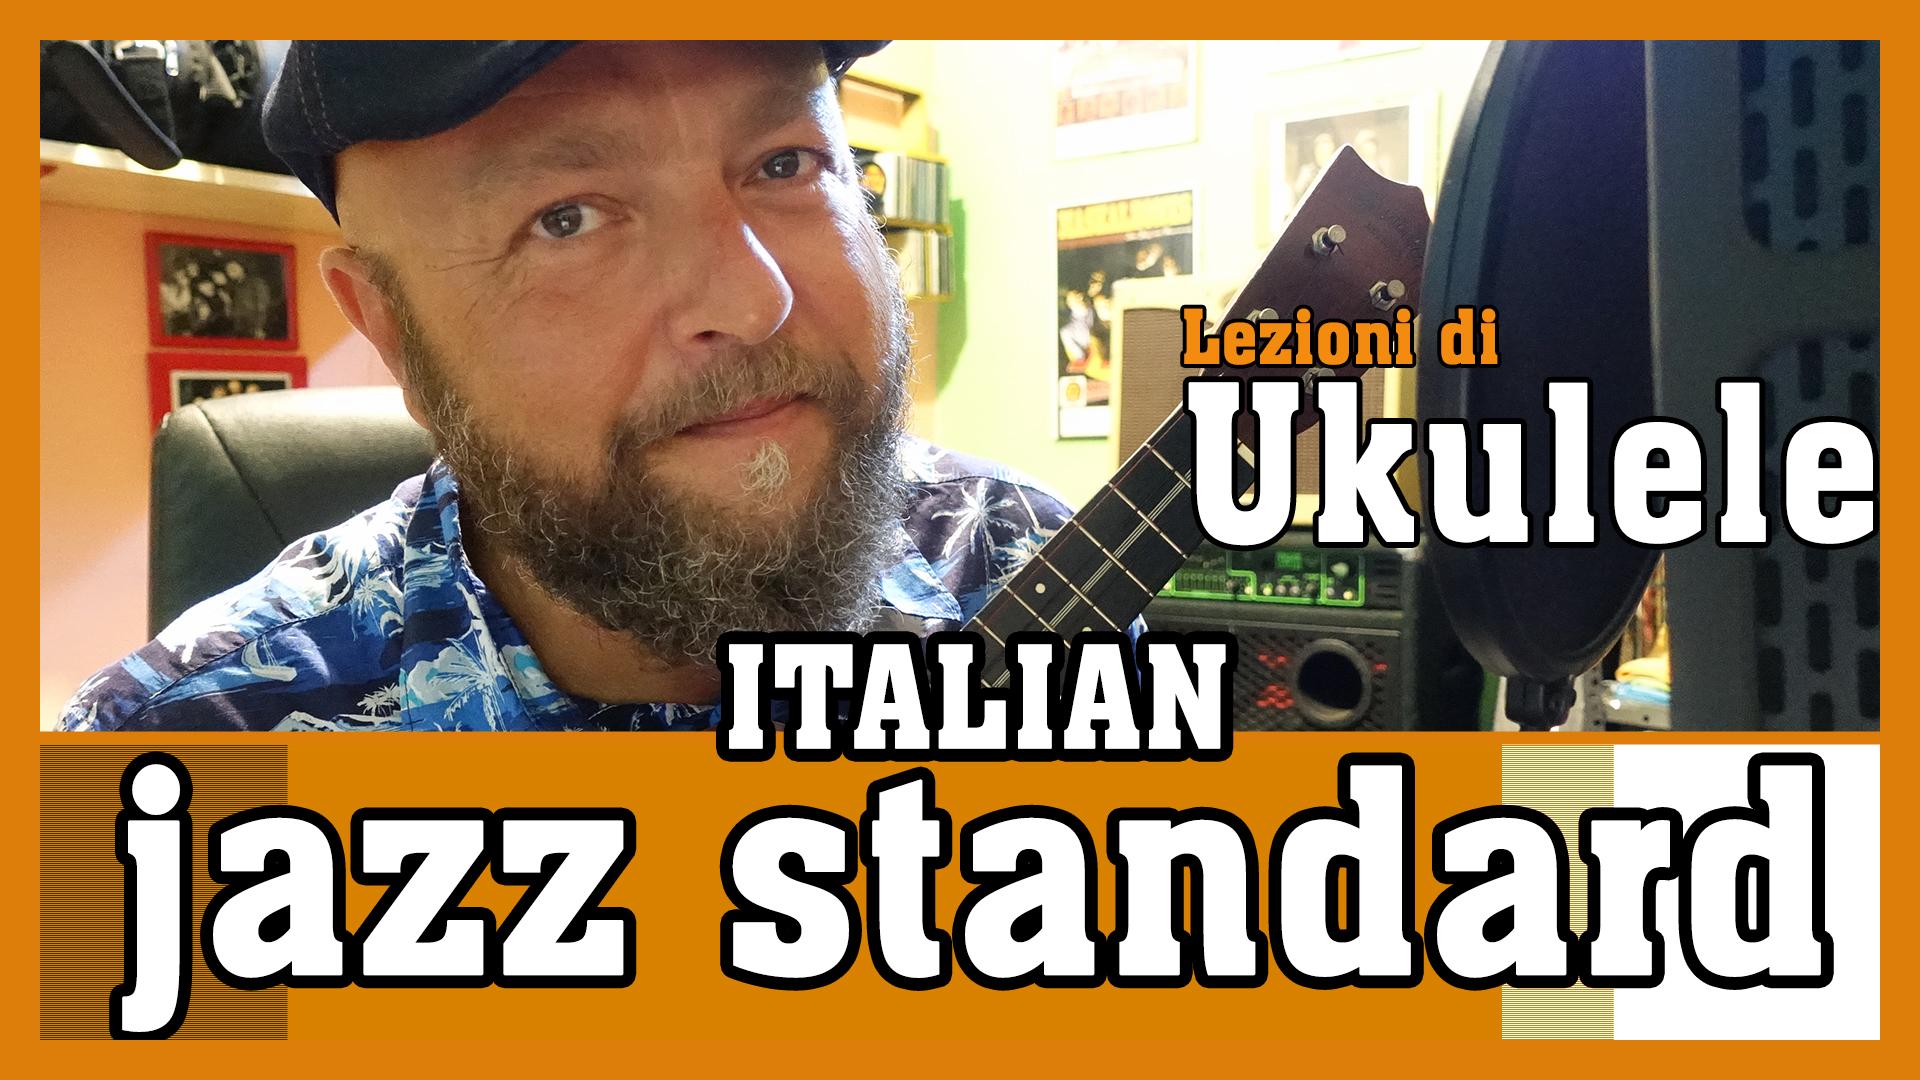 Se stasera sono qui - Italian ukulele jazz standard